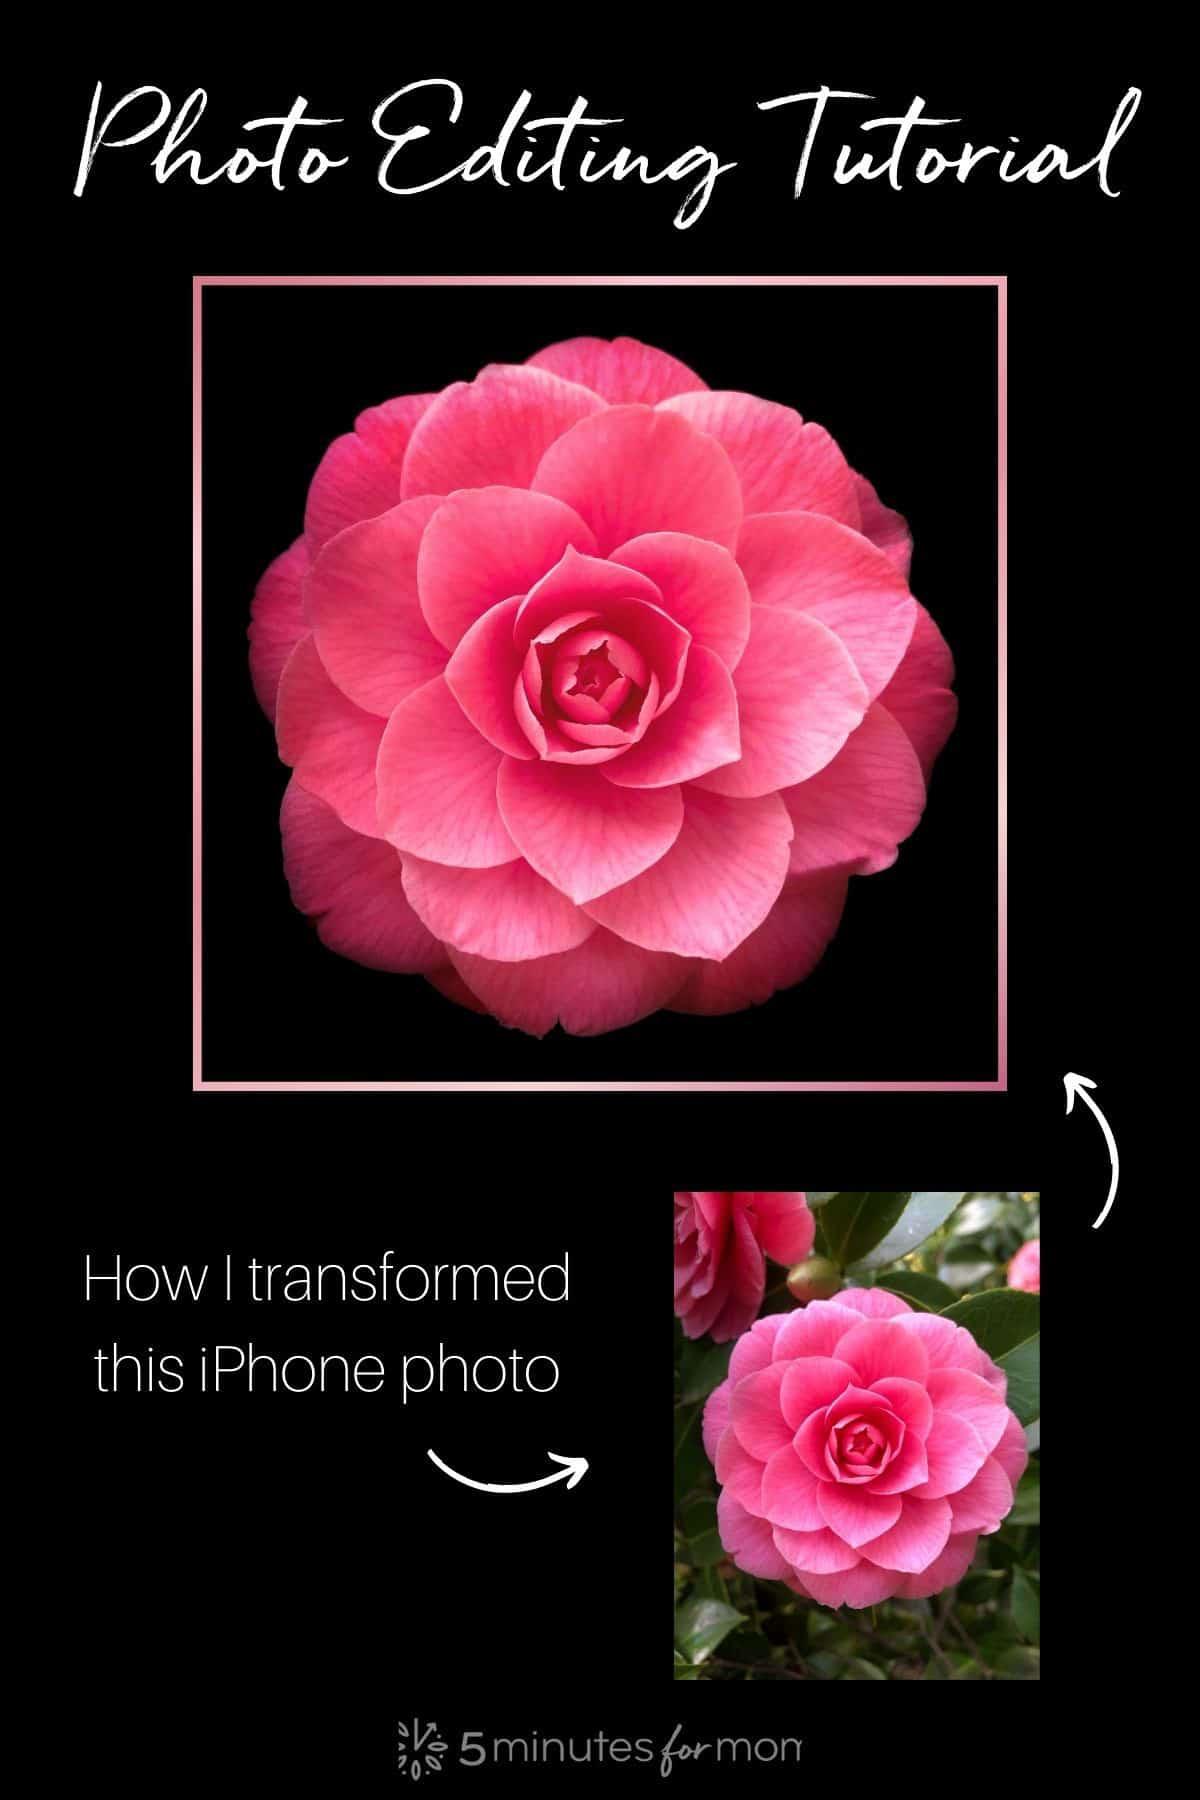 Photo editing tutorial using vignette tool on Snapseed